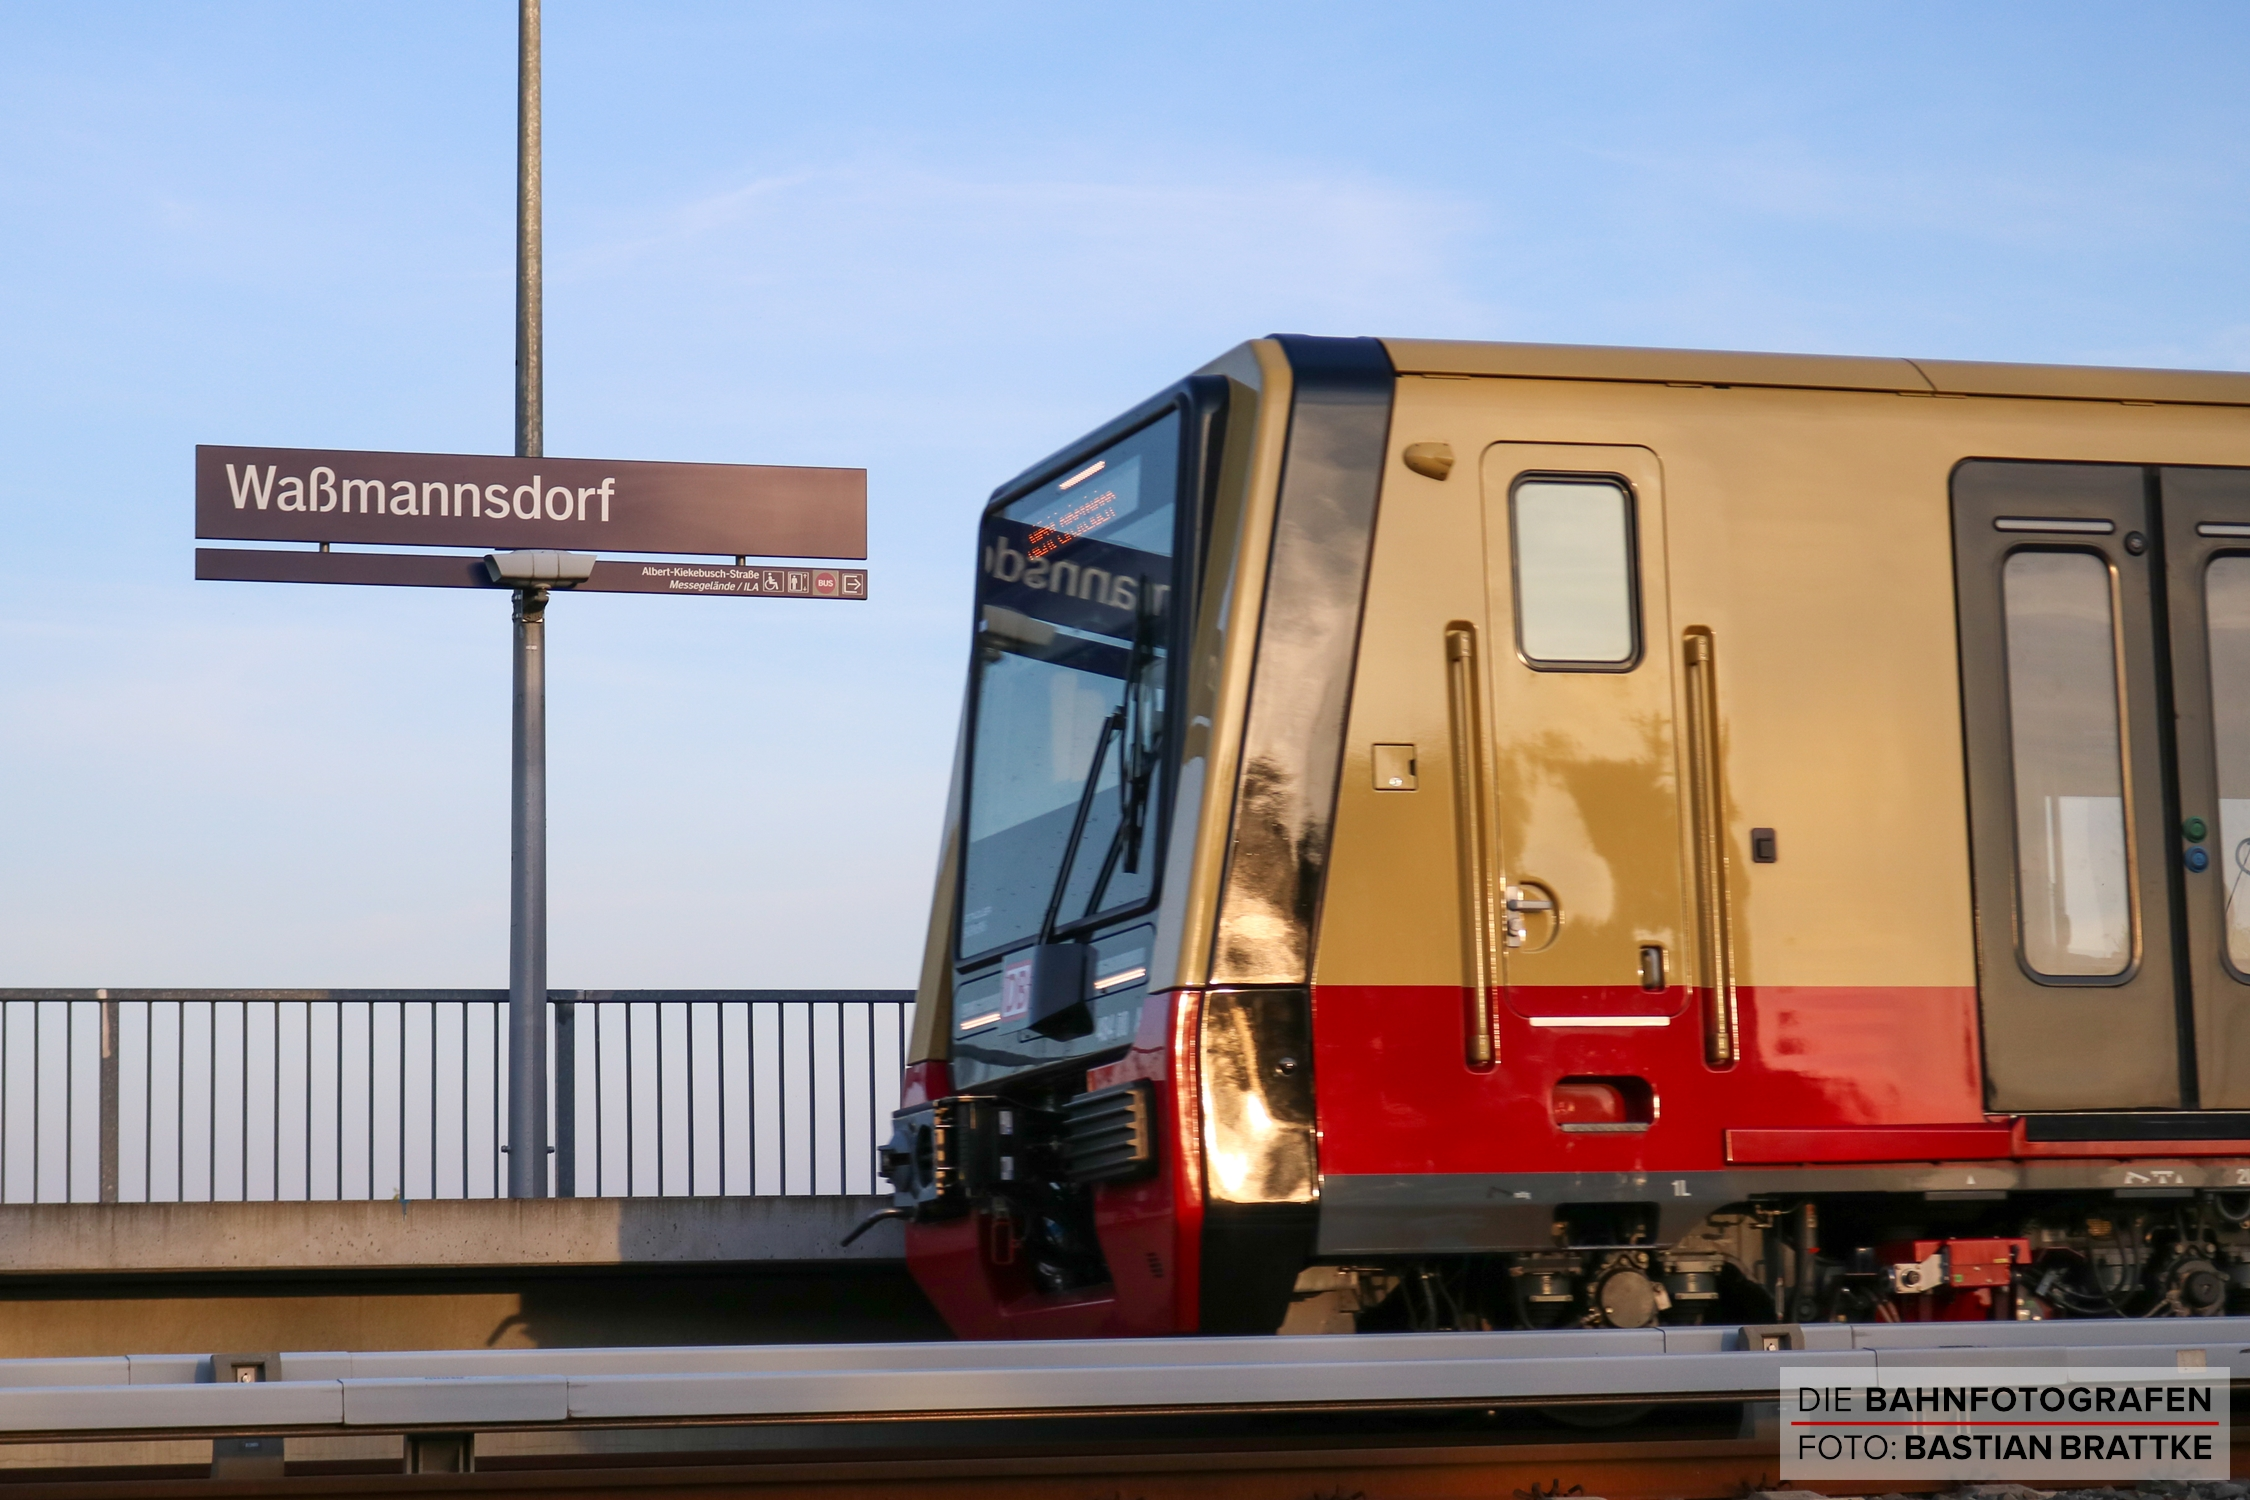 https://diebahnfotografen.de/wp-content/uploads/2020/06/483-002-484-003-Wa%C3%9Fmannsdorf.jpg